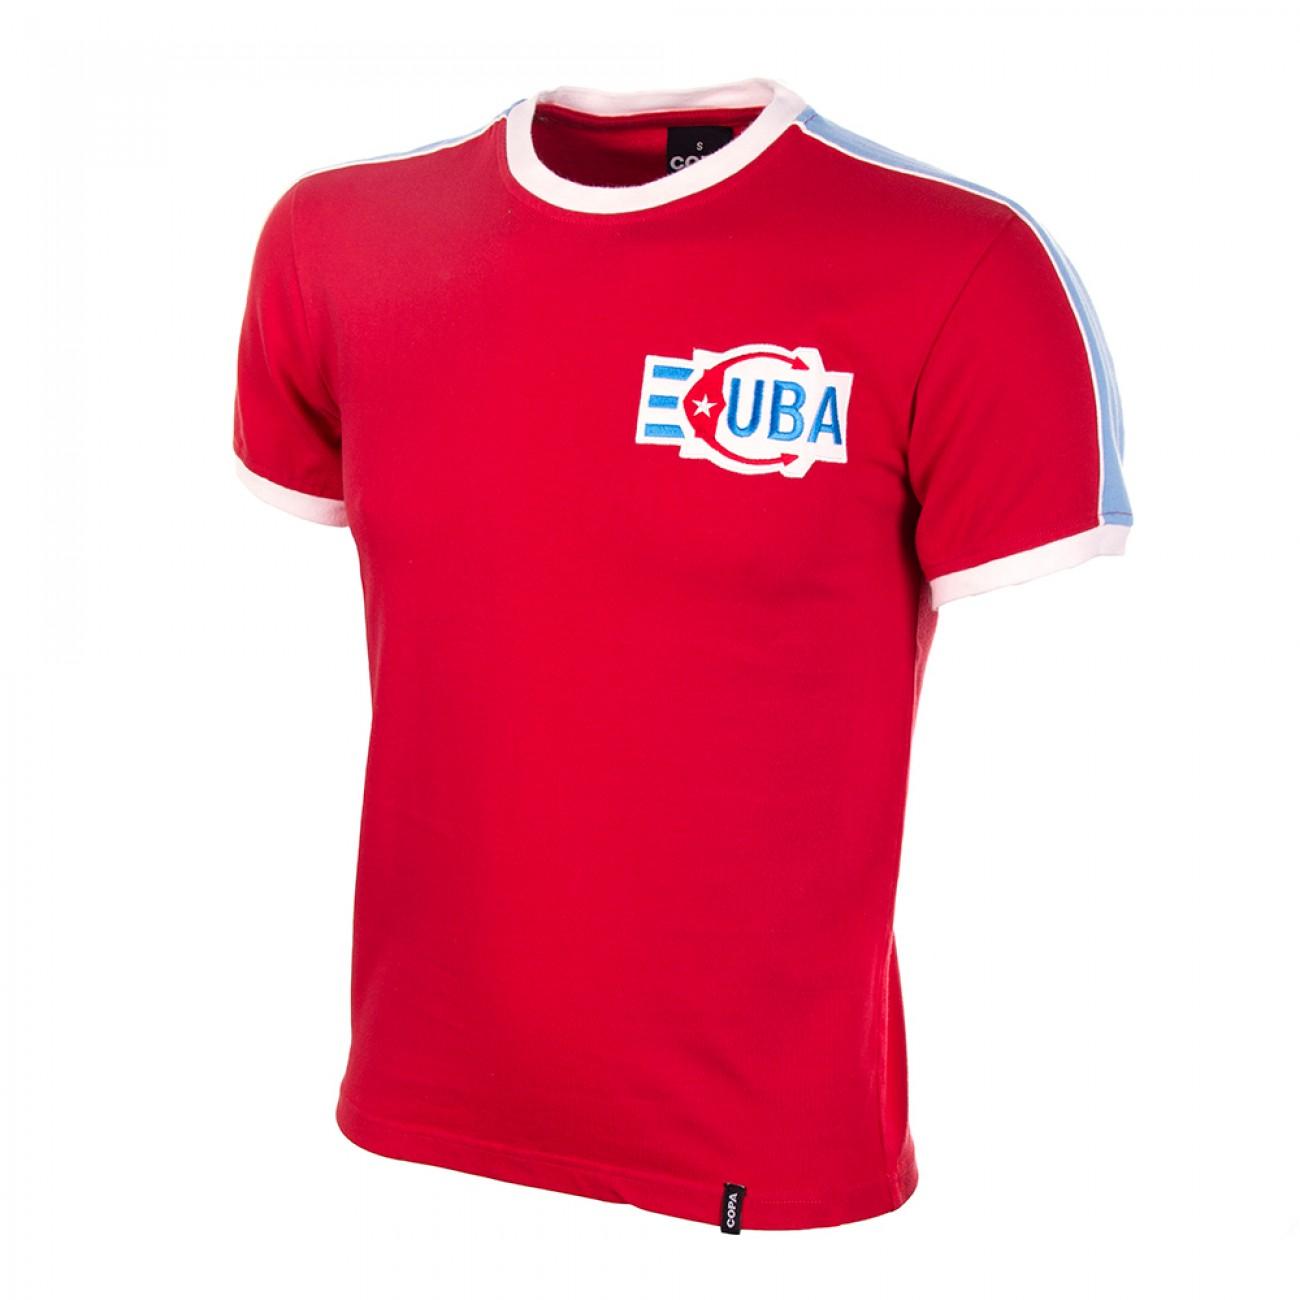 http://www.retrofootball.es/ropa-de-futbol/camiseta-retro-cuba-a-os-80.html